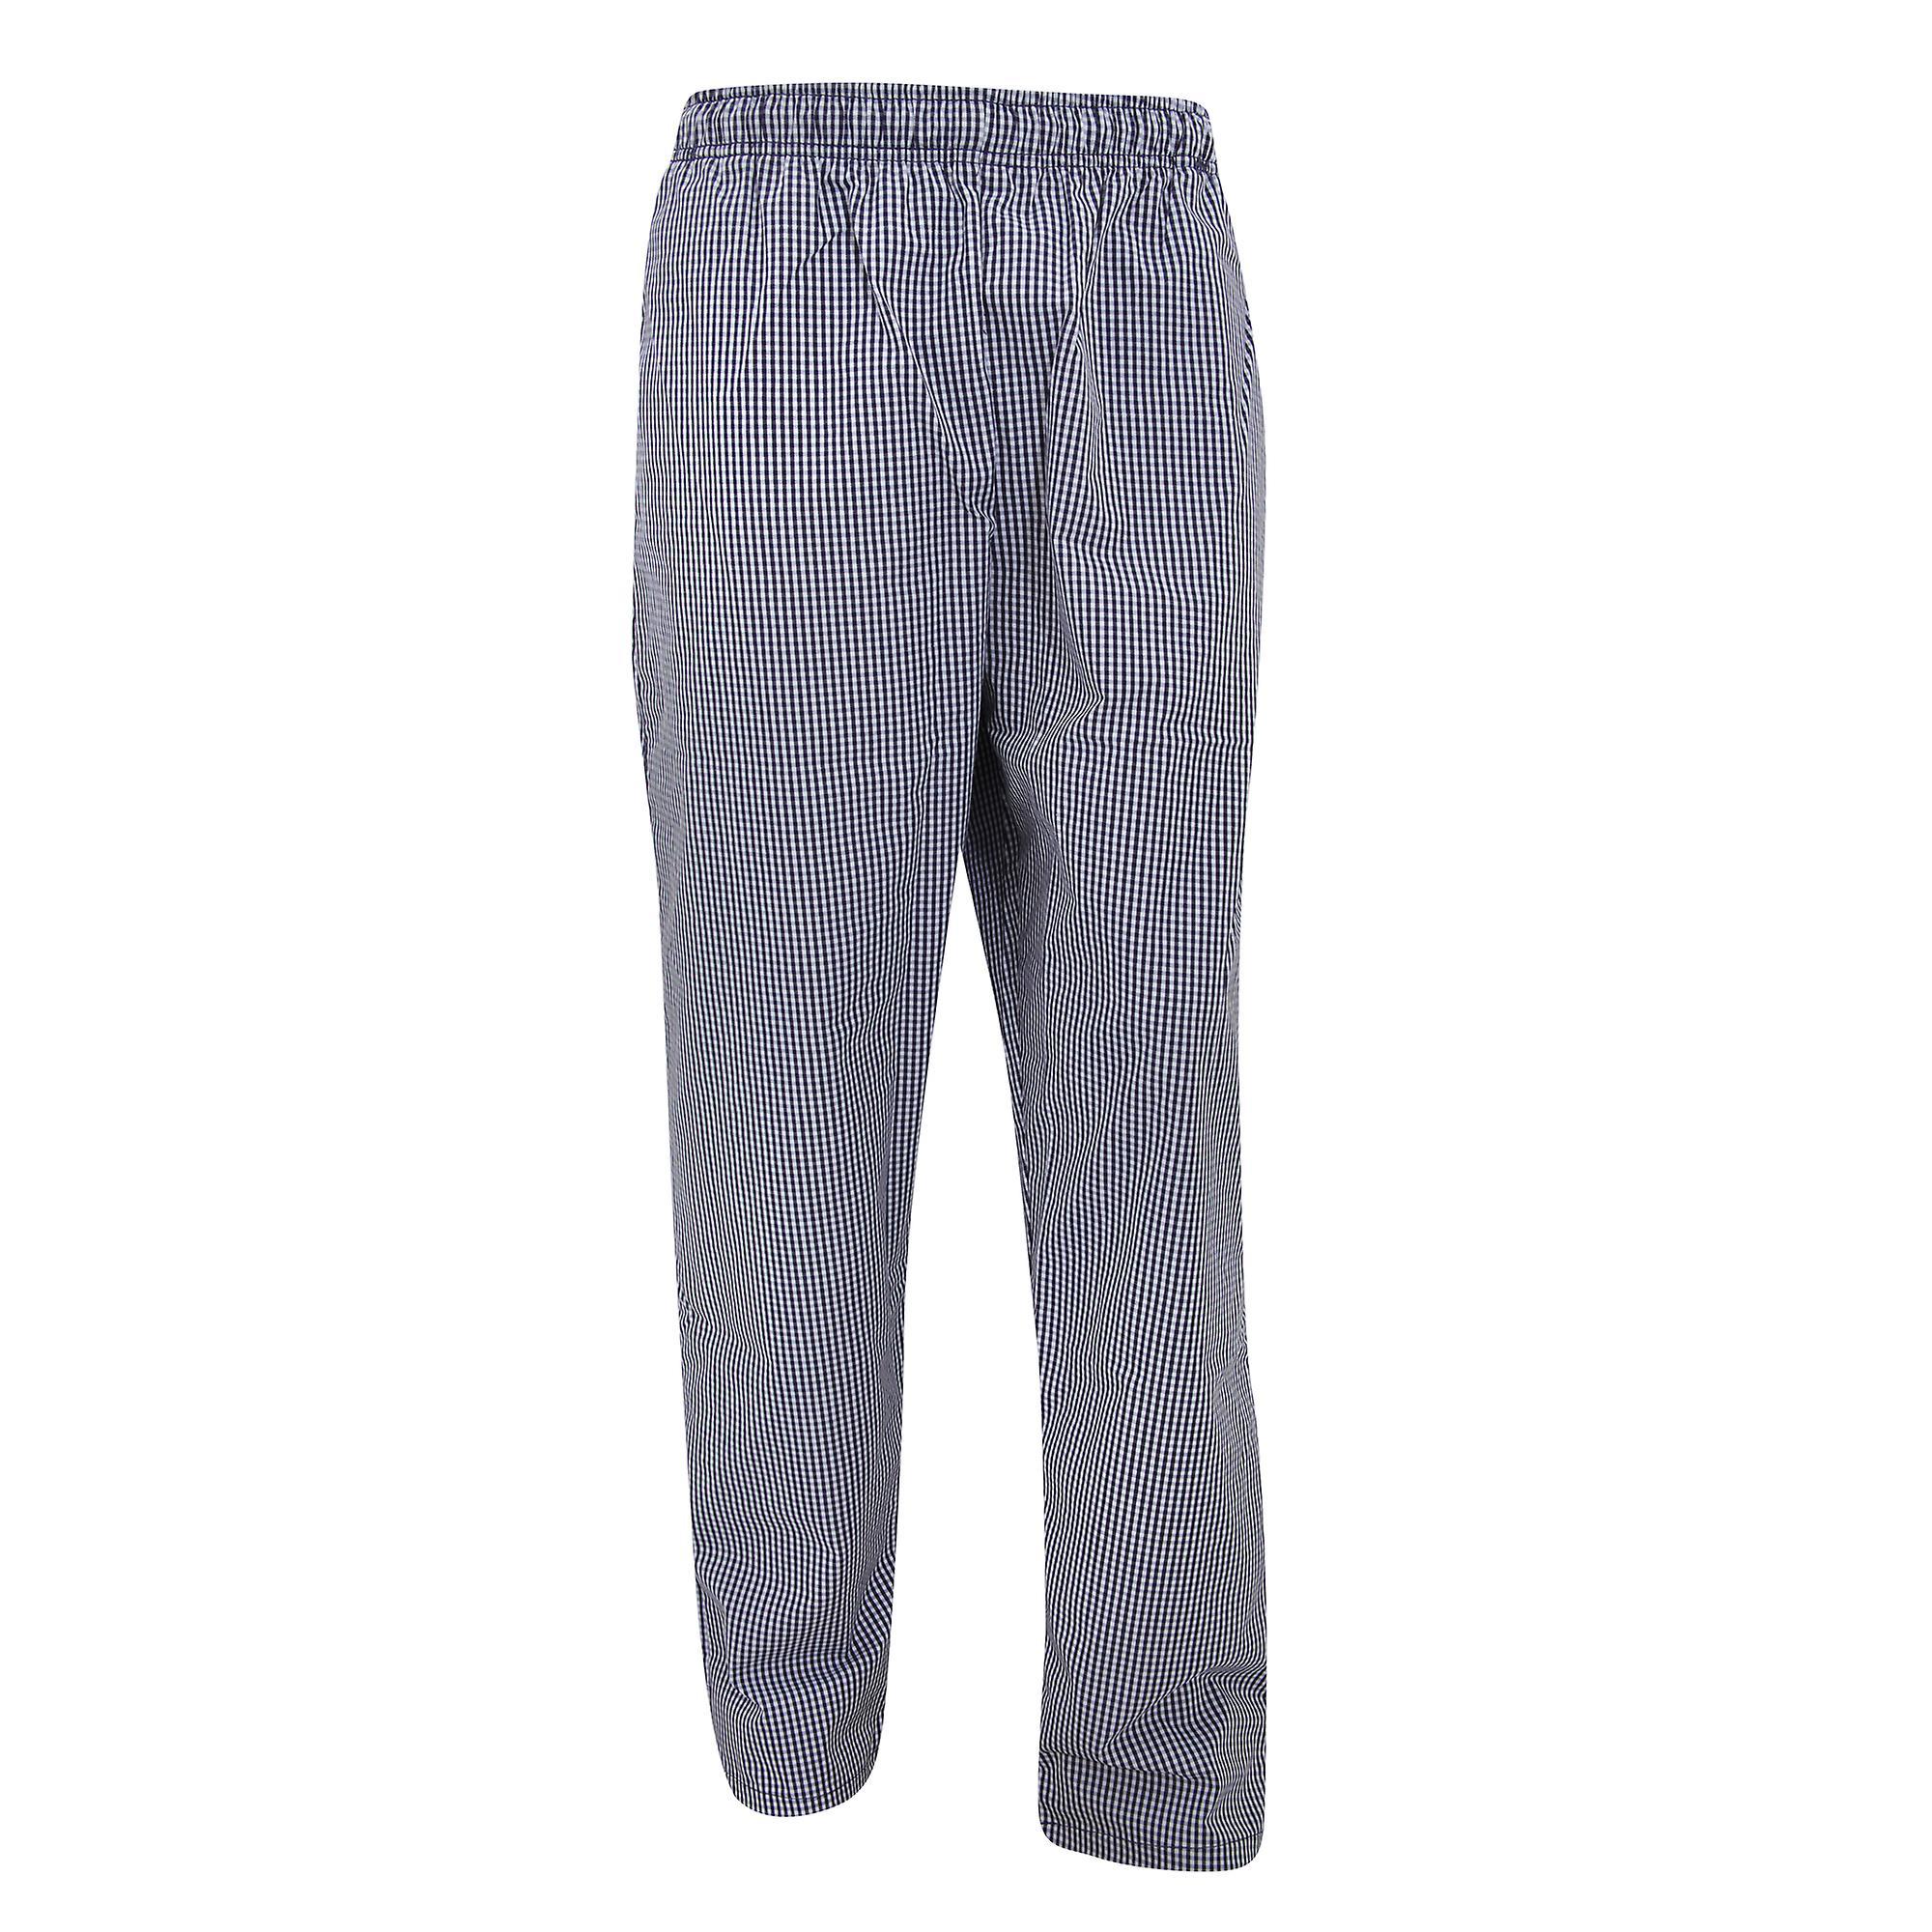 Dennys Unisex Blue/White Check Fully Elasticated Trouser / Chefswear (Pack of 2)